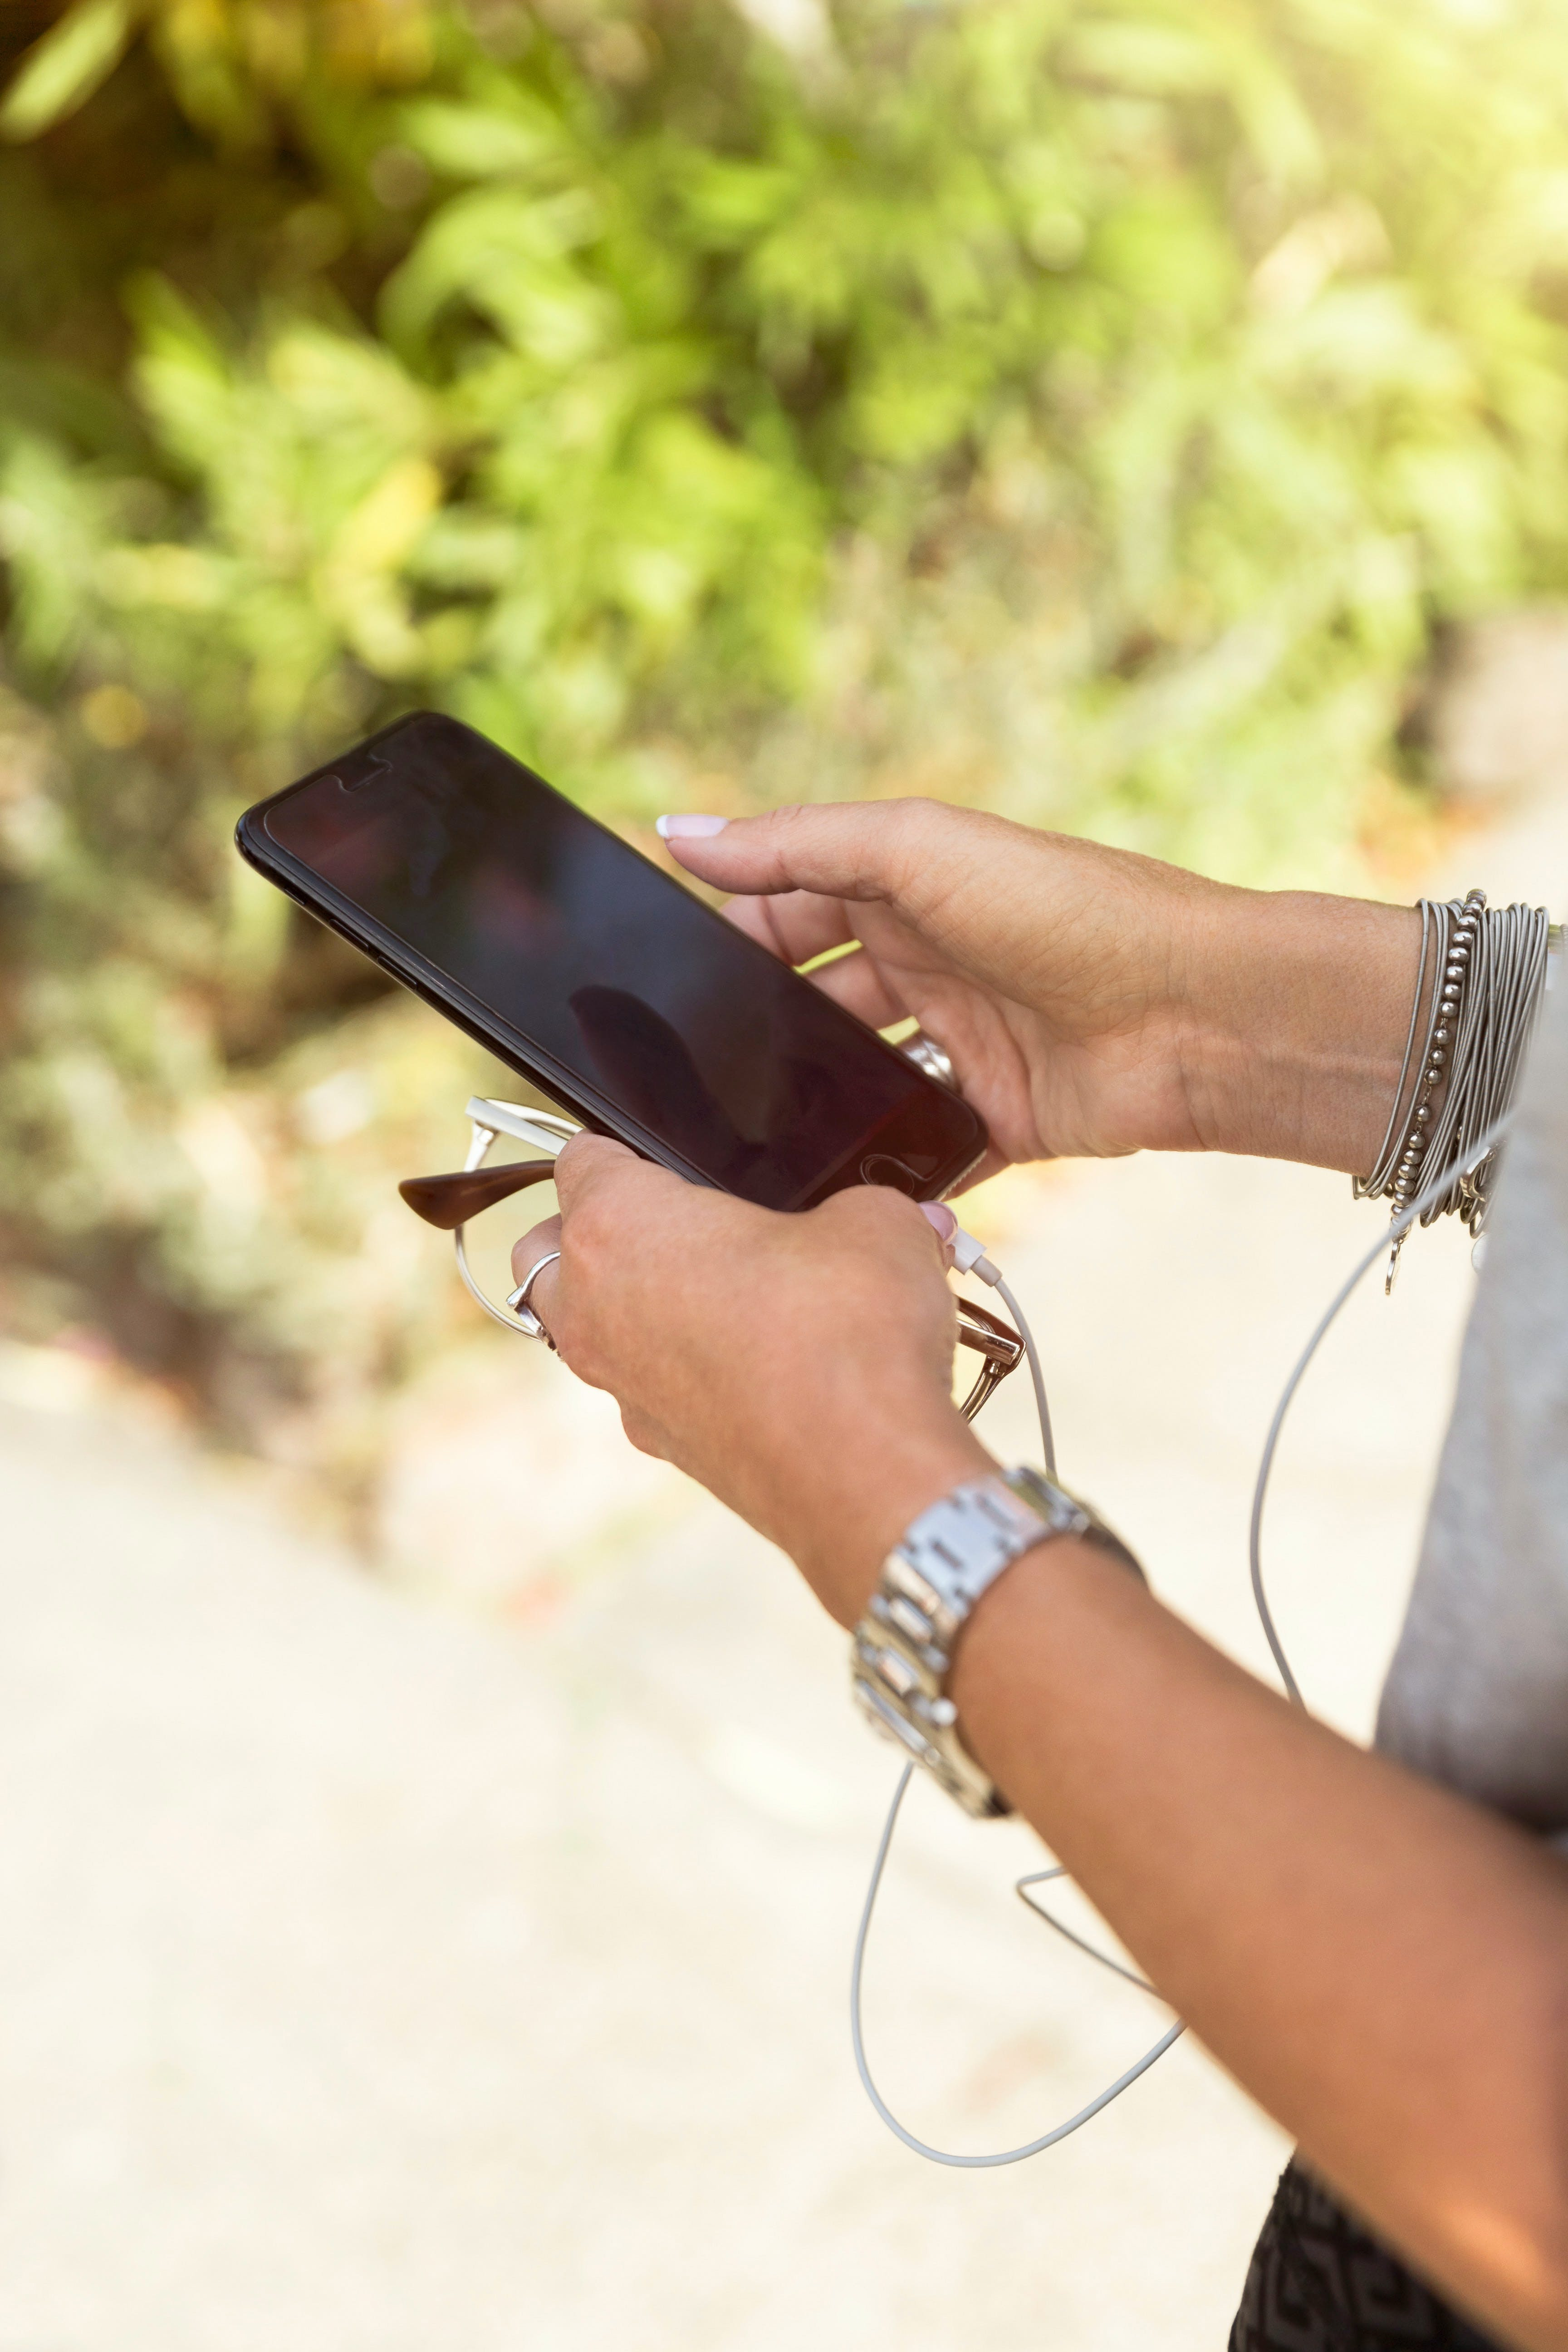 Woman Using Black Iphone 7at Daytime